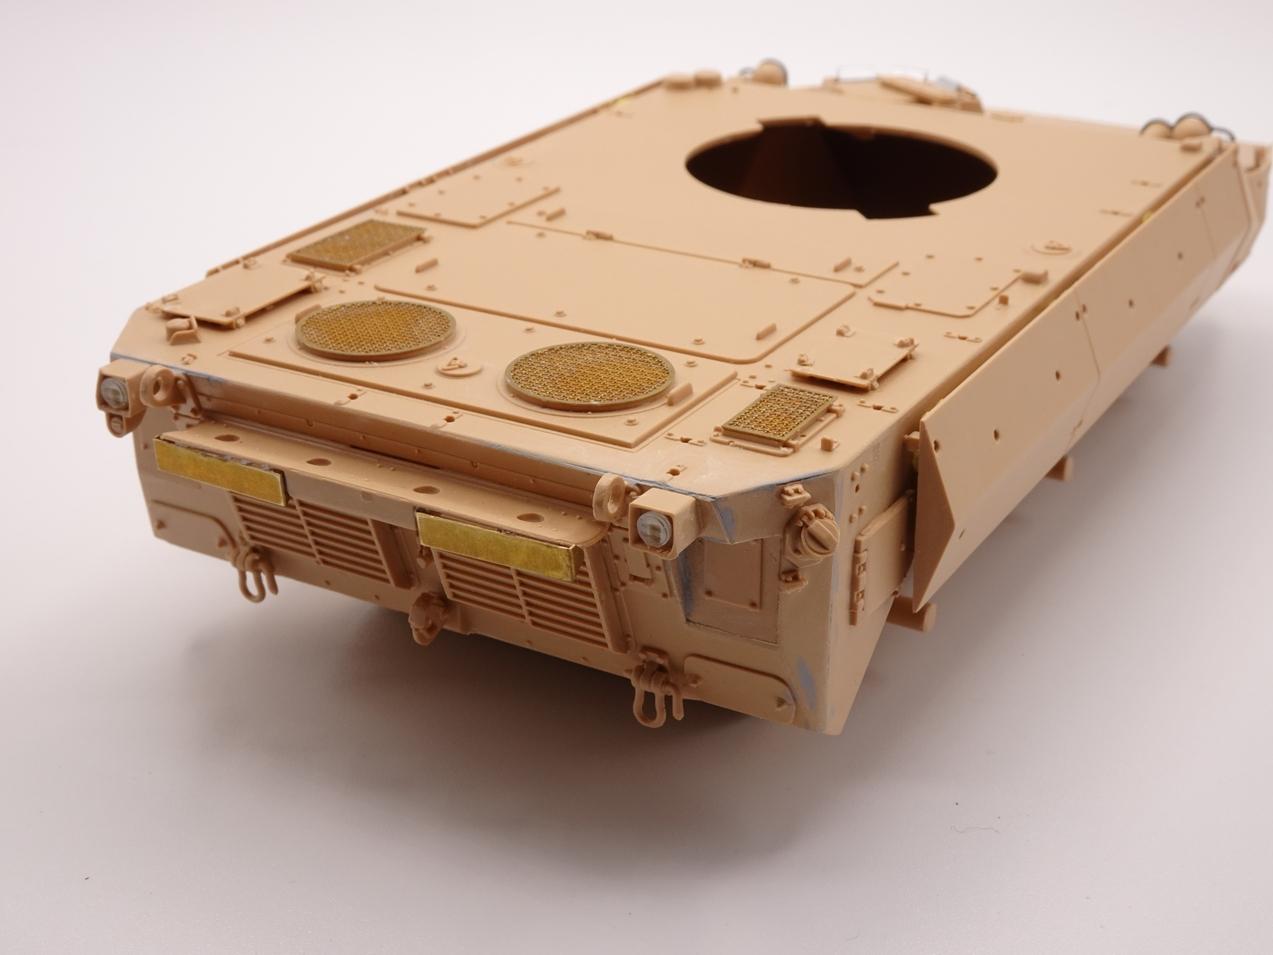 [Tiger Model] AMX-10RCR réf. 4602 - 1/35 - Page 2 Amx10-1907-3